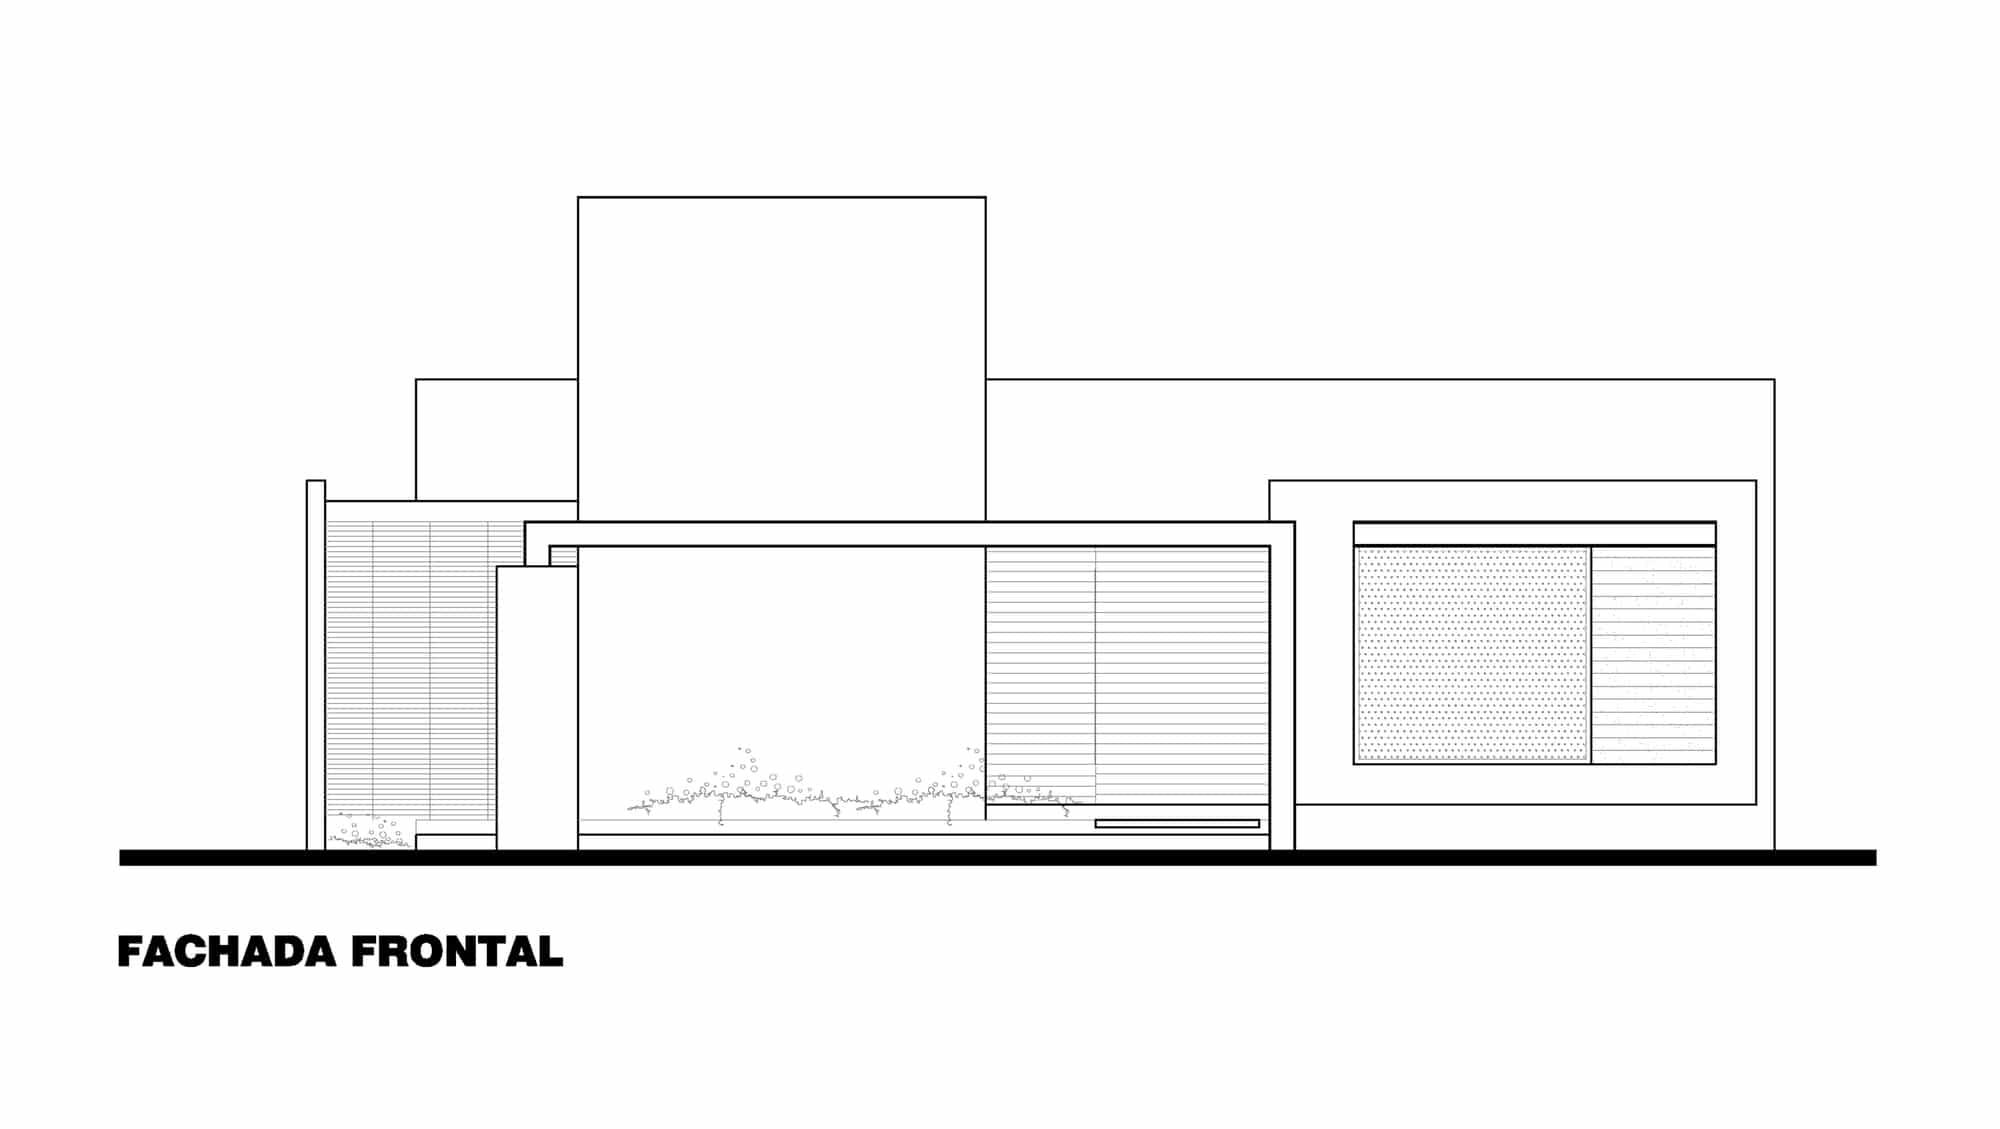 Plano de fachada frontal de casa de un piso construye hogar for Plano casa un piso